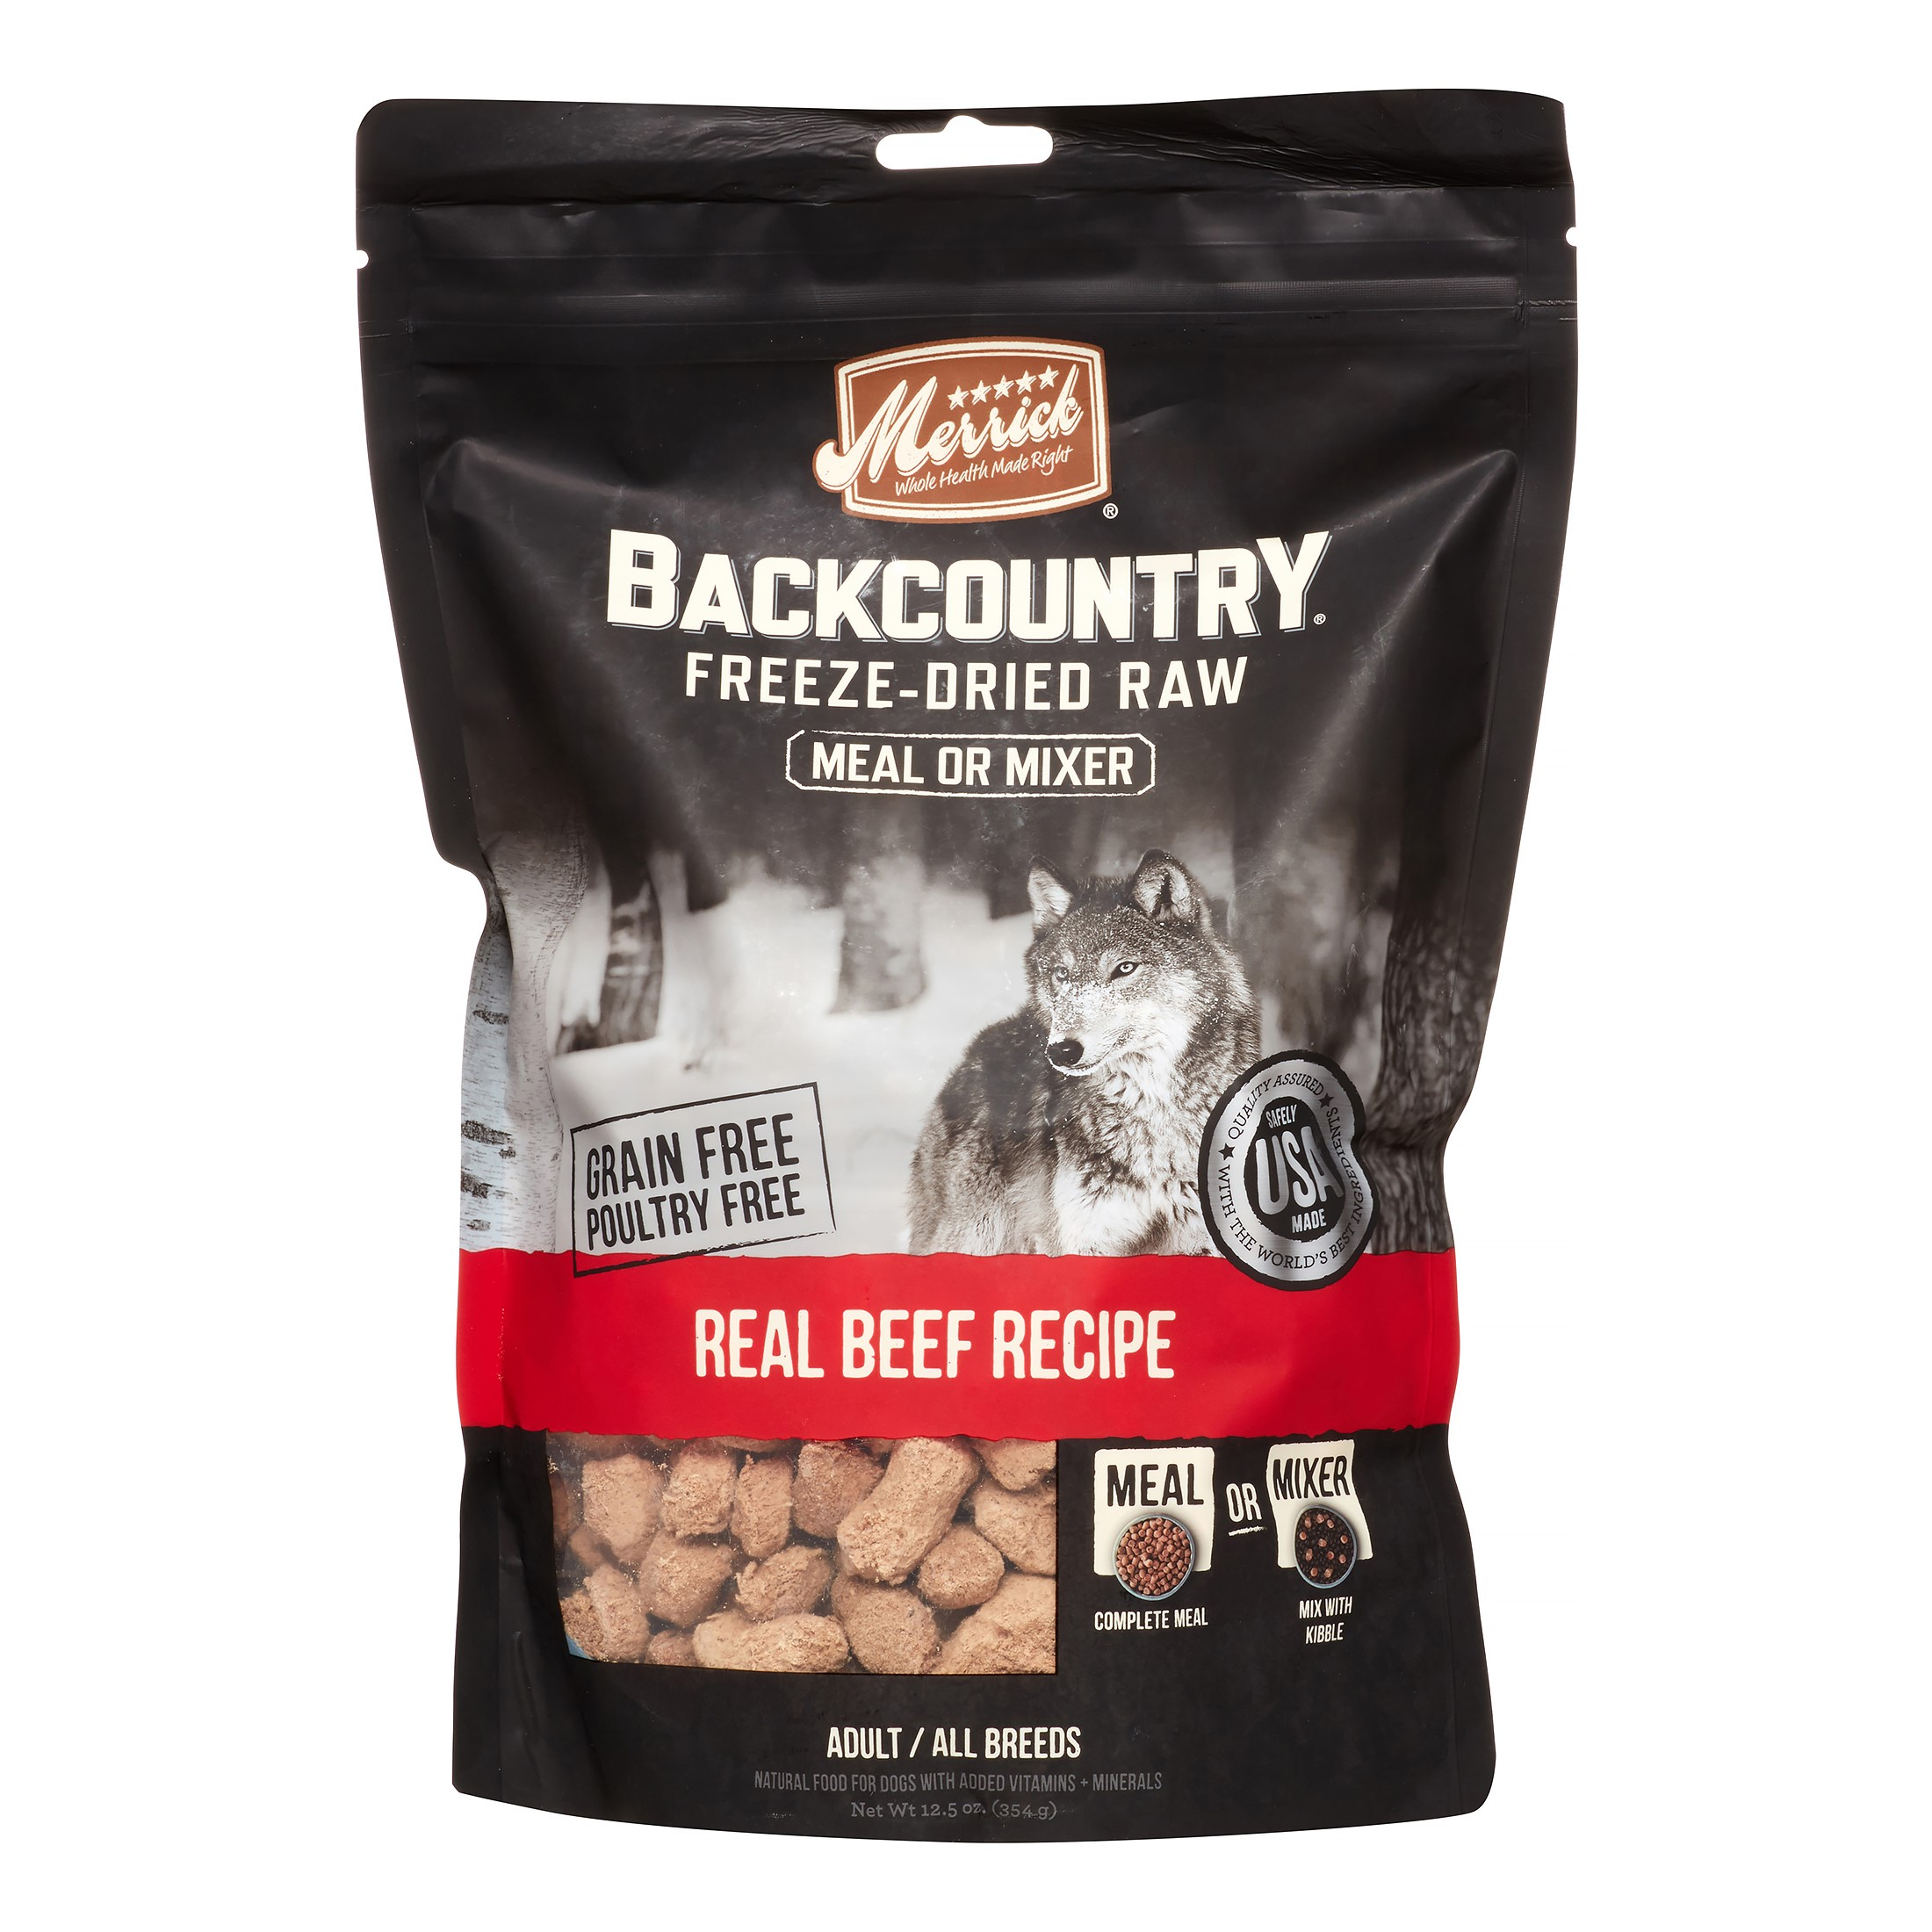 Merrick Backcountry Grain-Free Real Beef Recipe Freeze Dried Dog Food, 12.5 oz